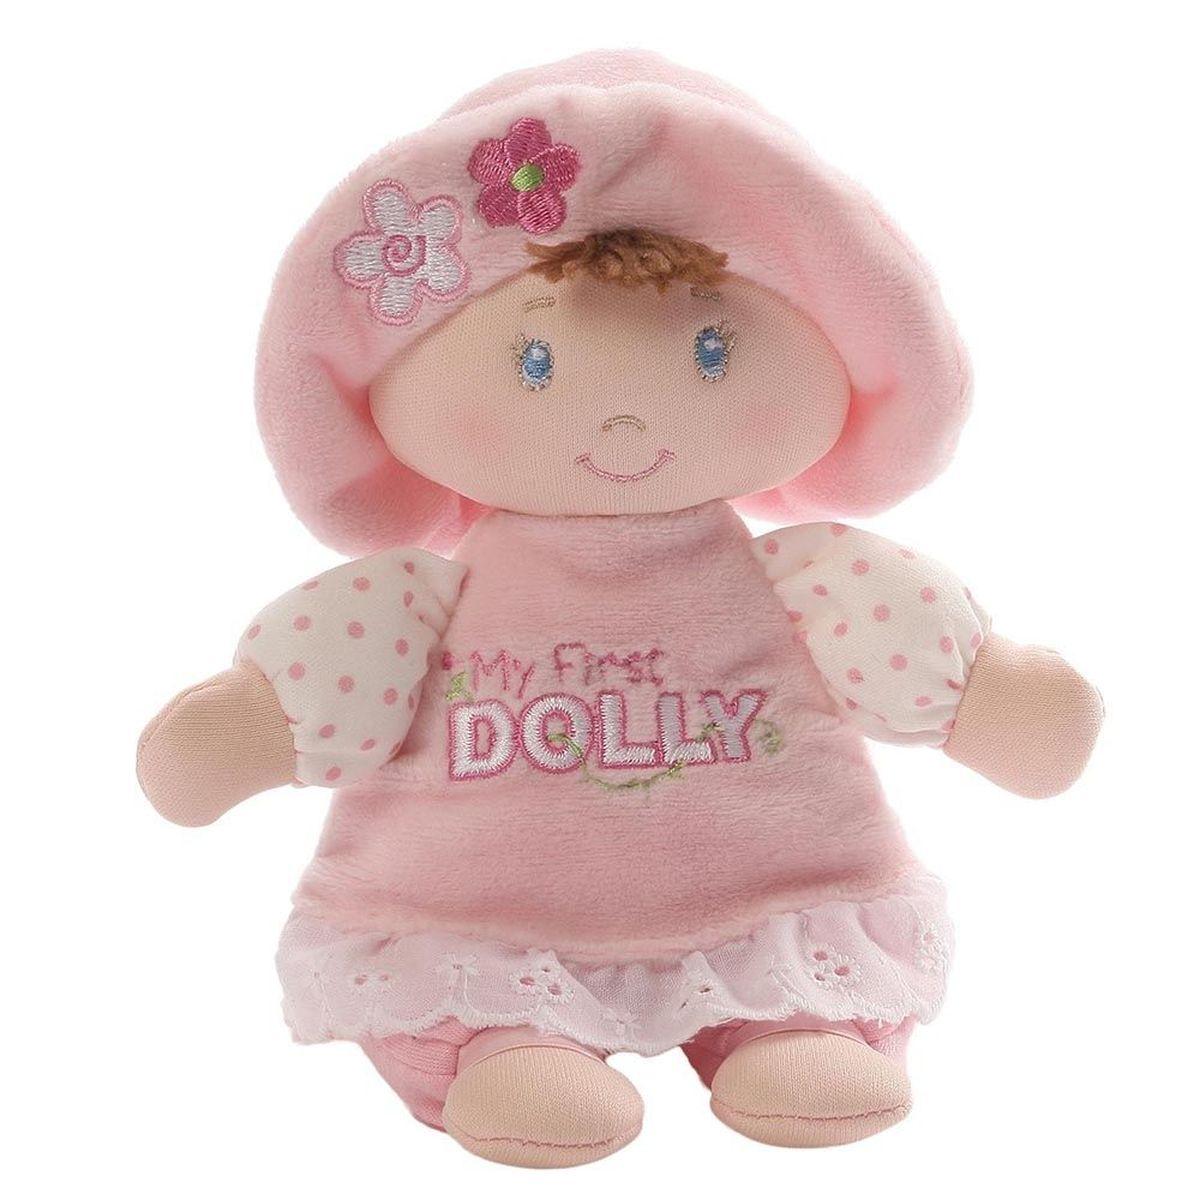 Купить Gund Мягкая игрушка My First Dolly Small Brunette Rattle 18 см, Enesco